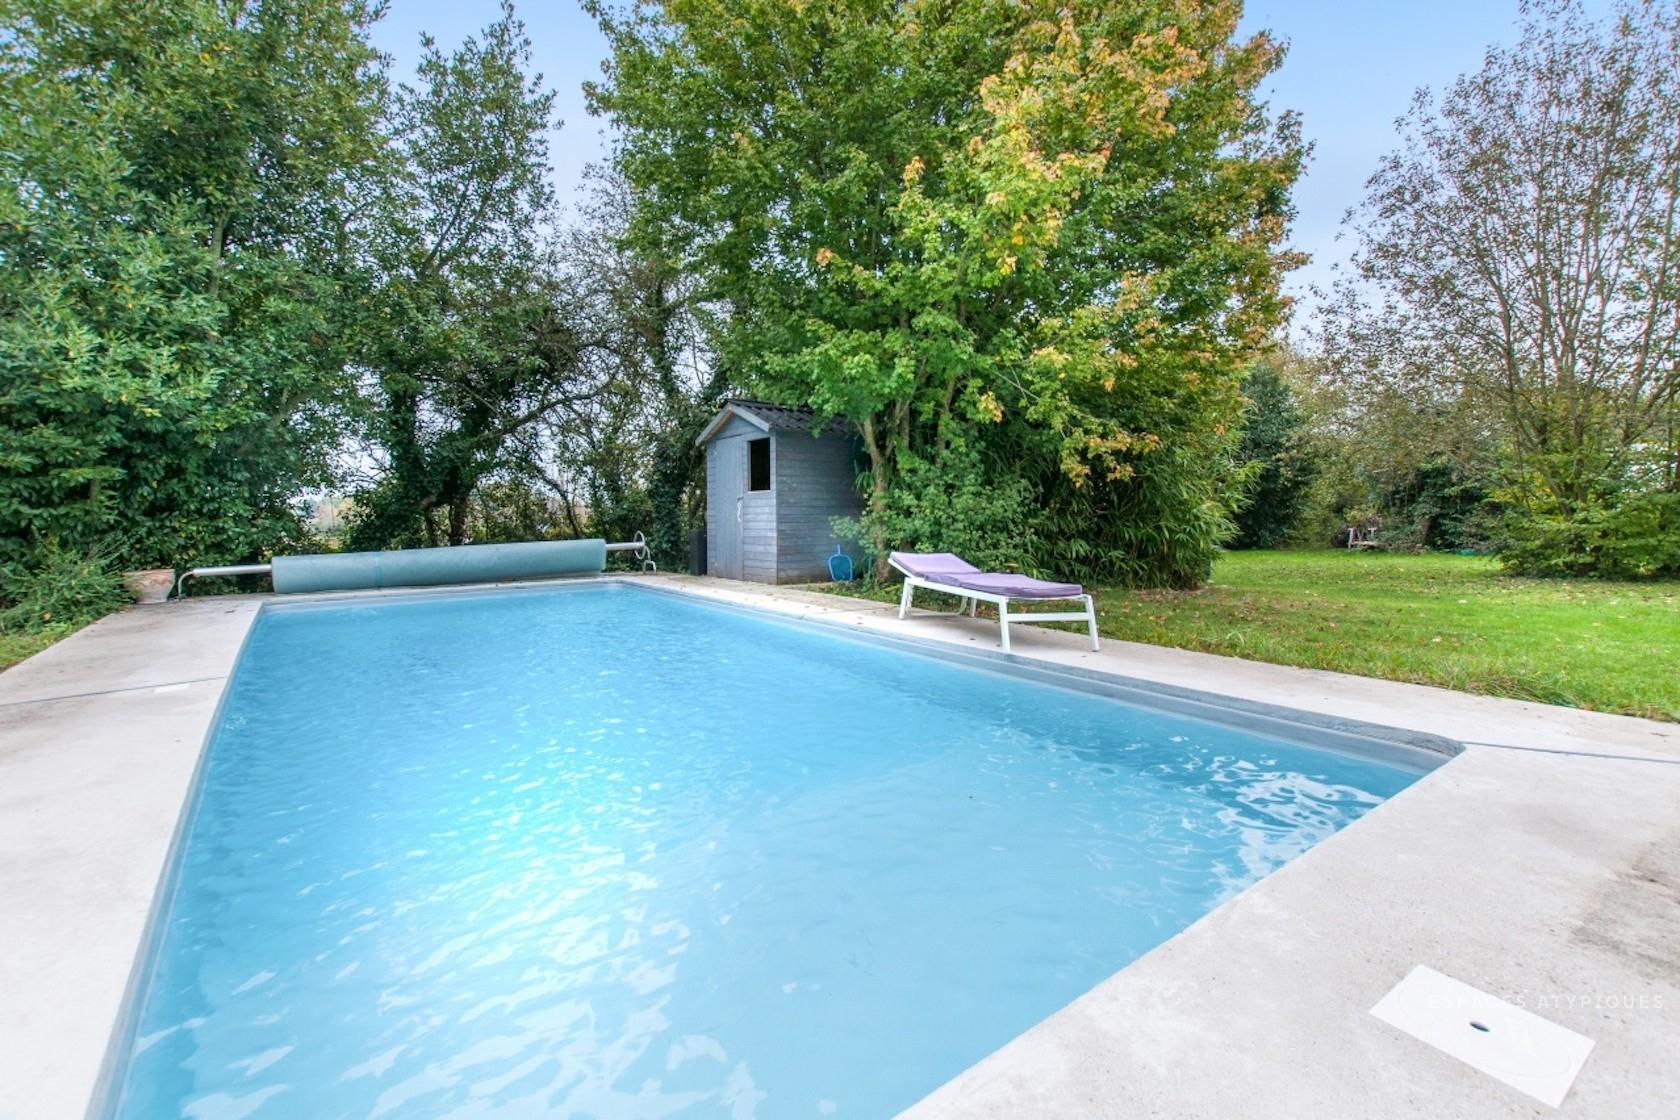 Nemours, St Ange Le Vieil : Stone Country House With Pool To ... avec Piscine De Moret Sur Loing